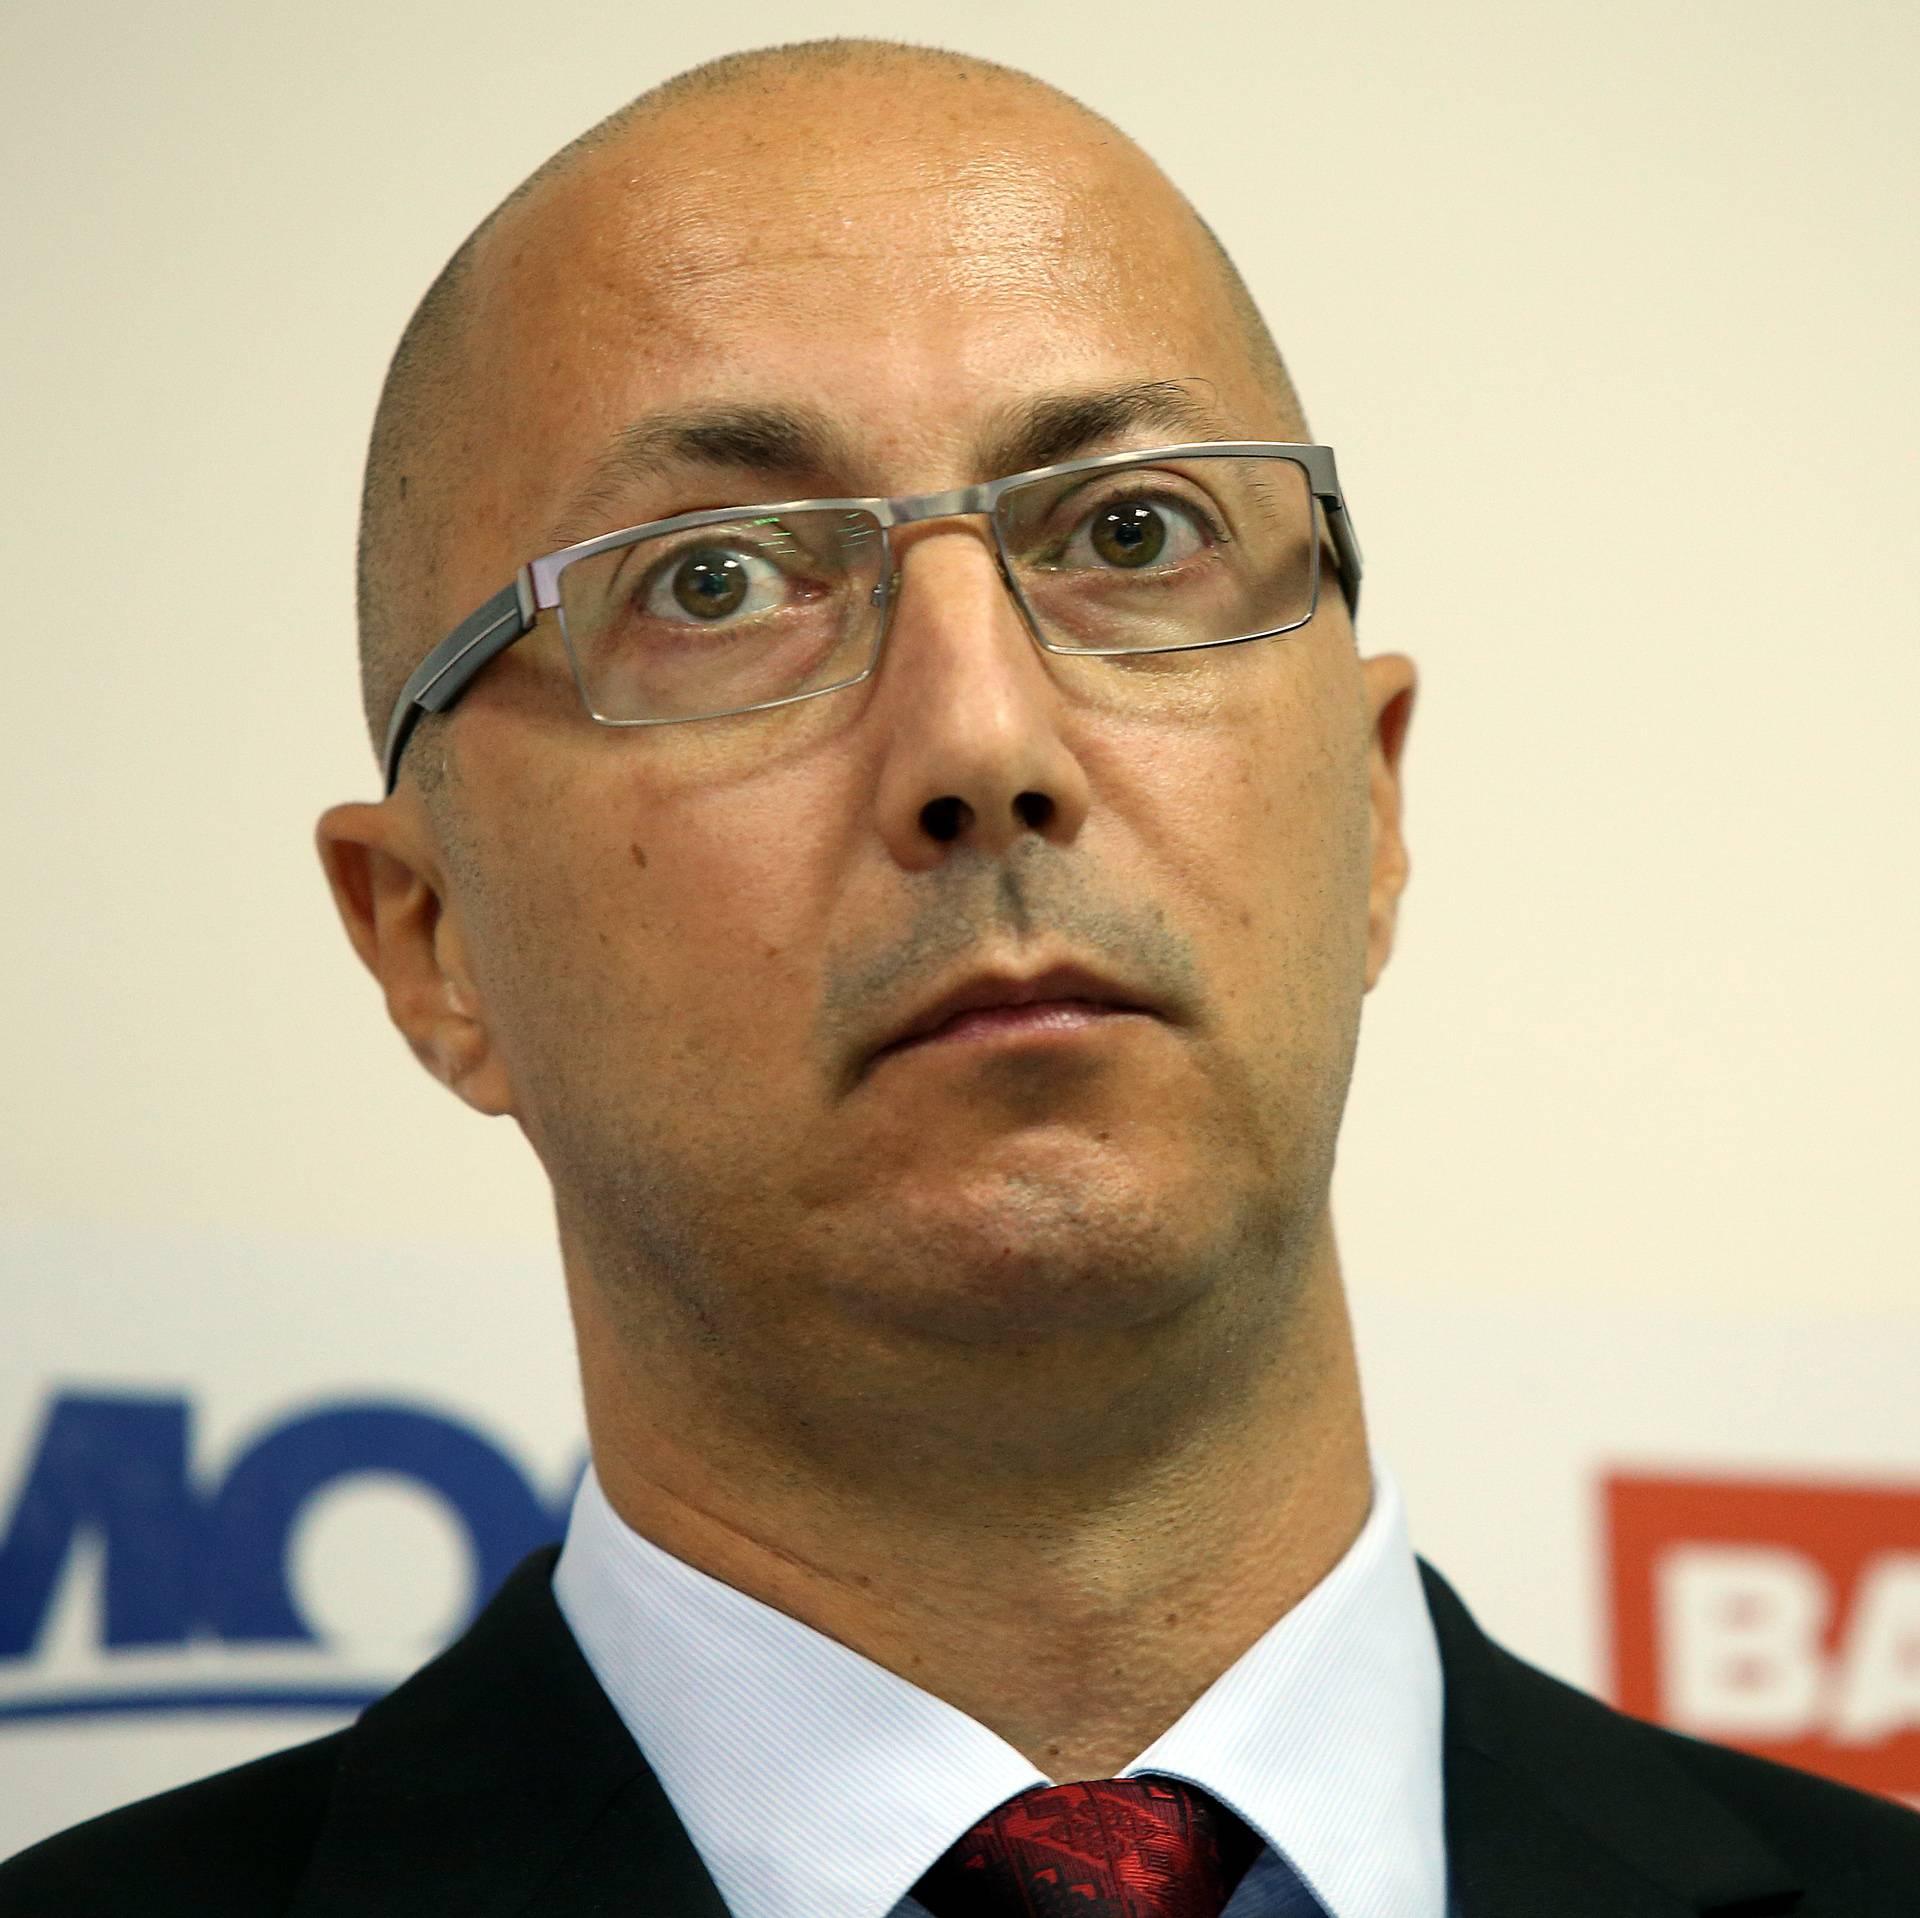 'Lustracija bi imala smisla tek kad bi se lustrirali HDZ i SDP'